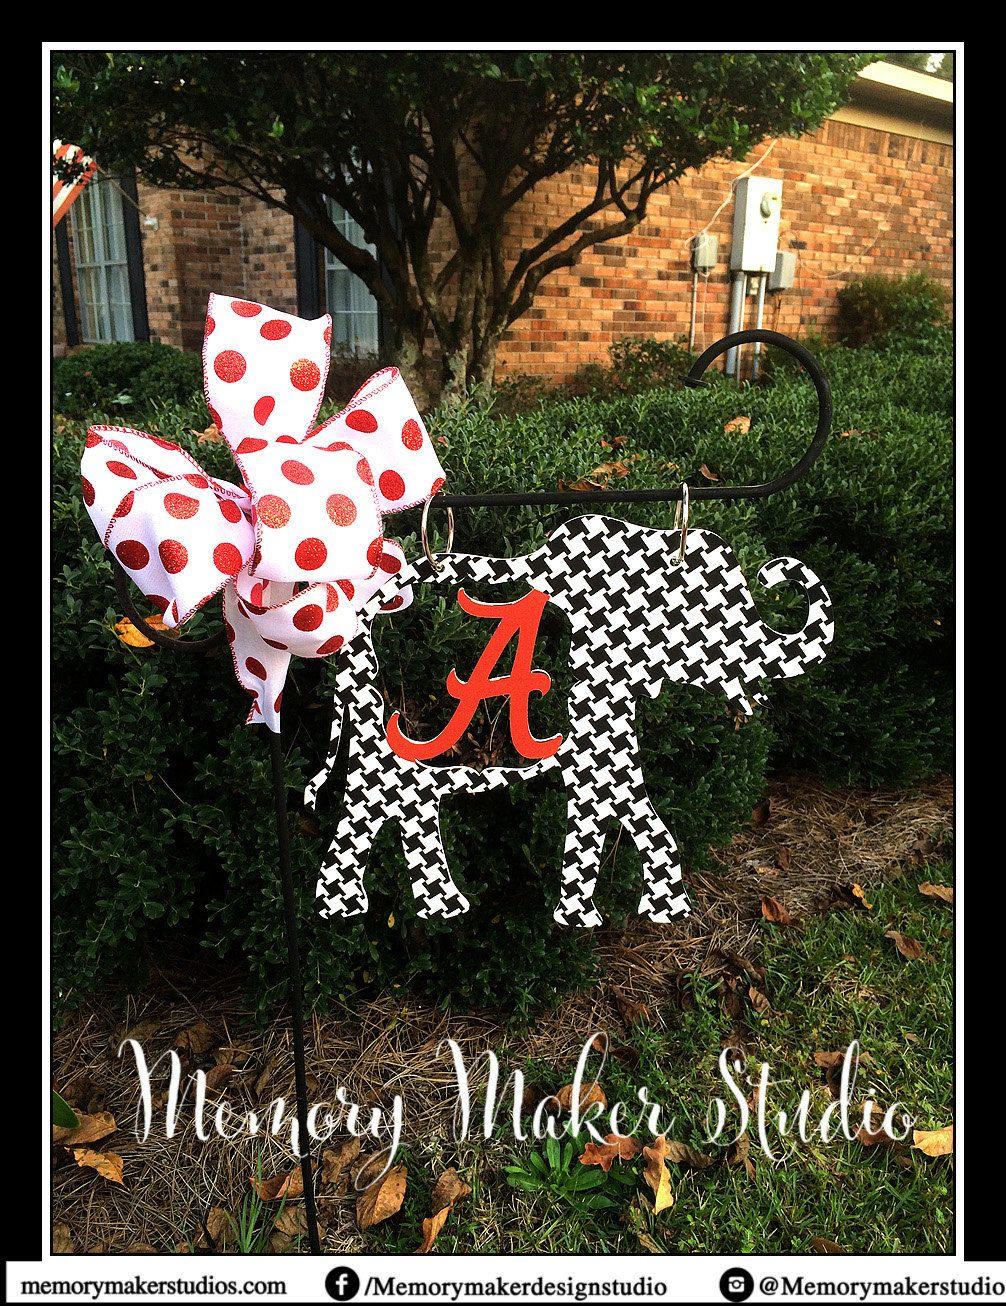 Delightful Alabama Houndstooth Elephant Lawn And Garden Flag, Houndstooth Garden Flag,  Houndstooth Yard Flag,